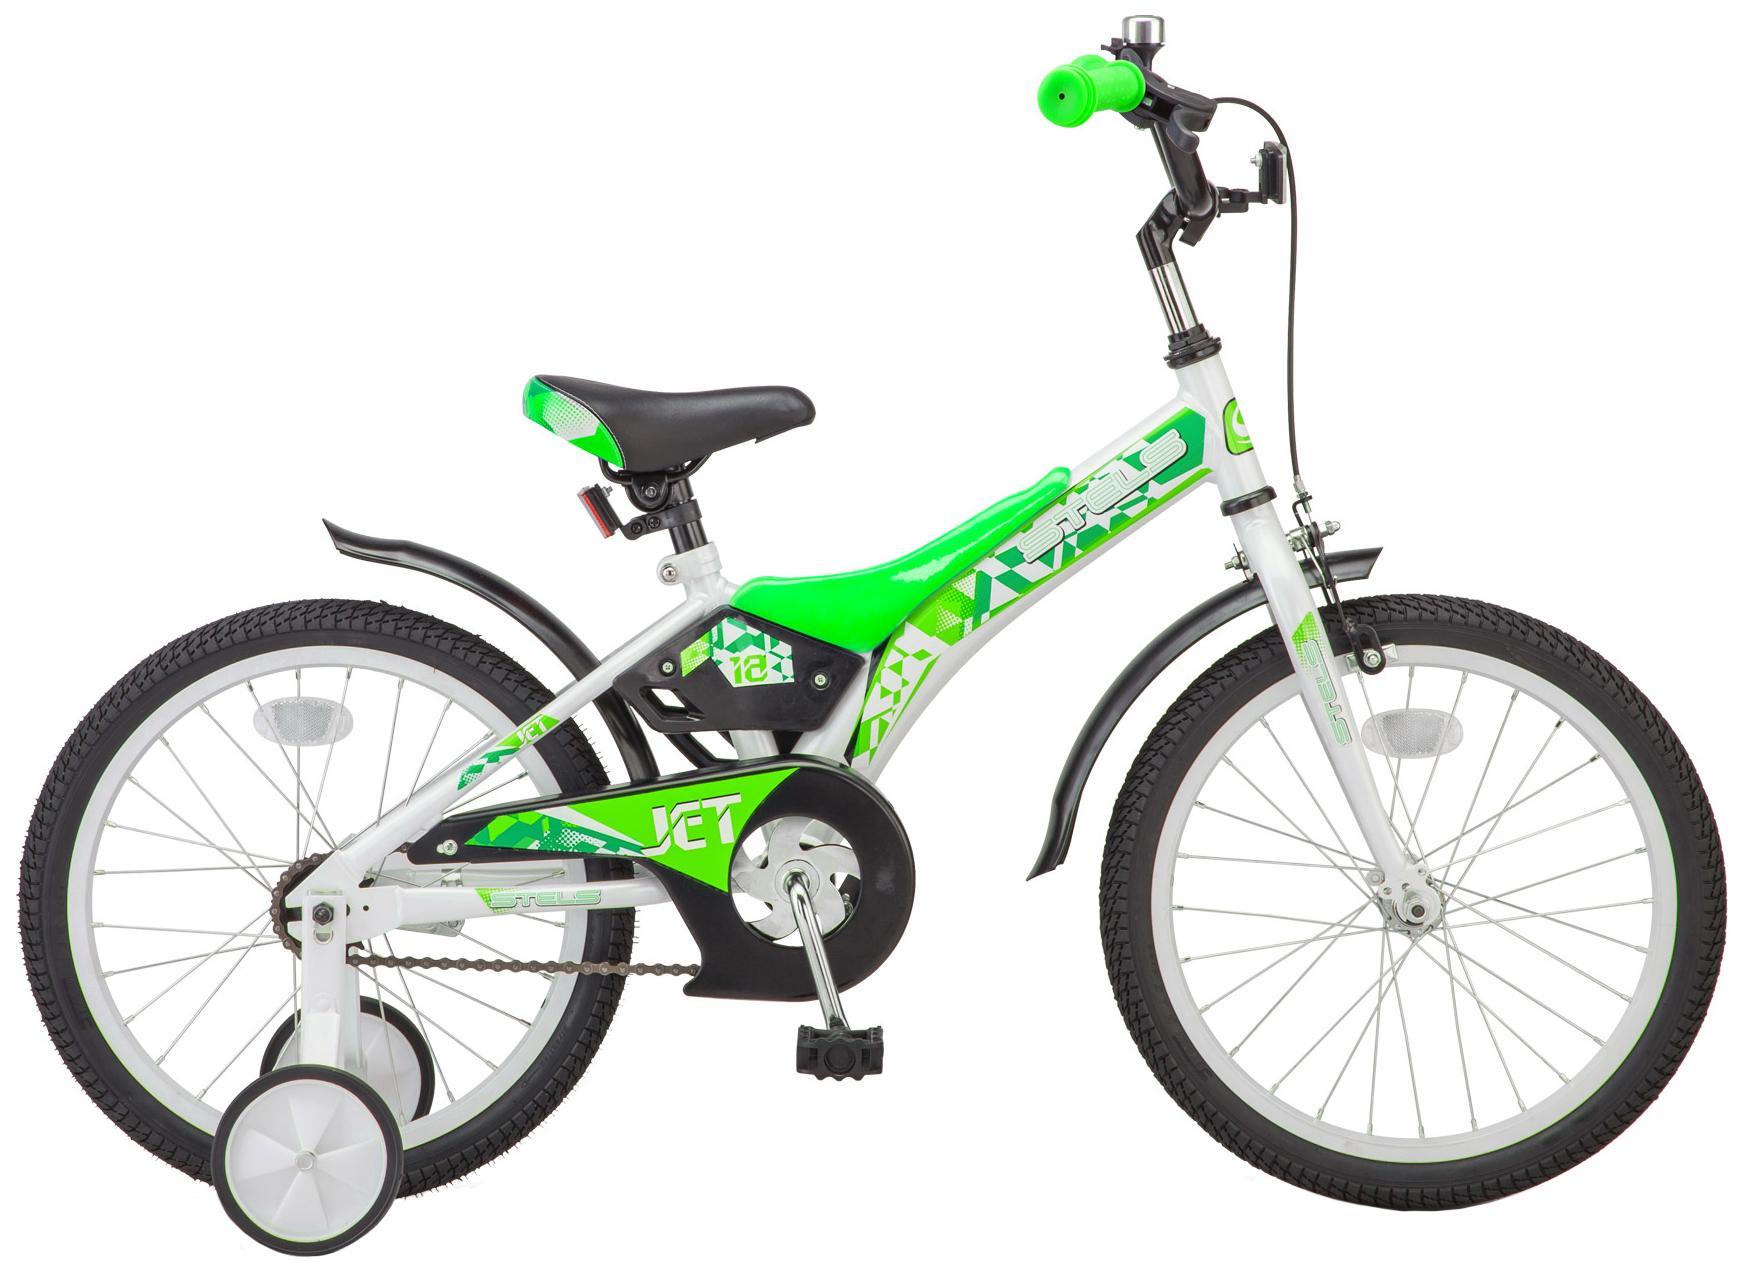 Велосипед STELS Jet 16 (Z010) белый/салатовый фото